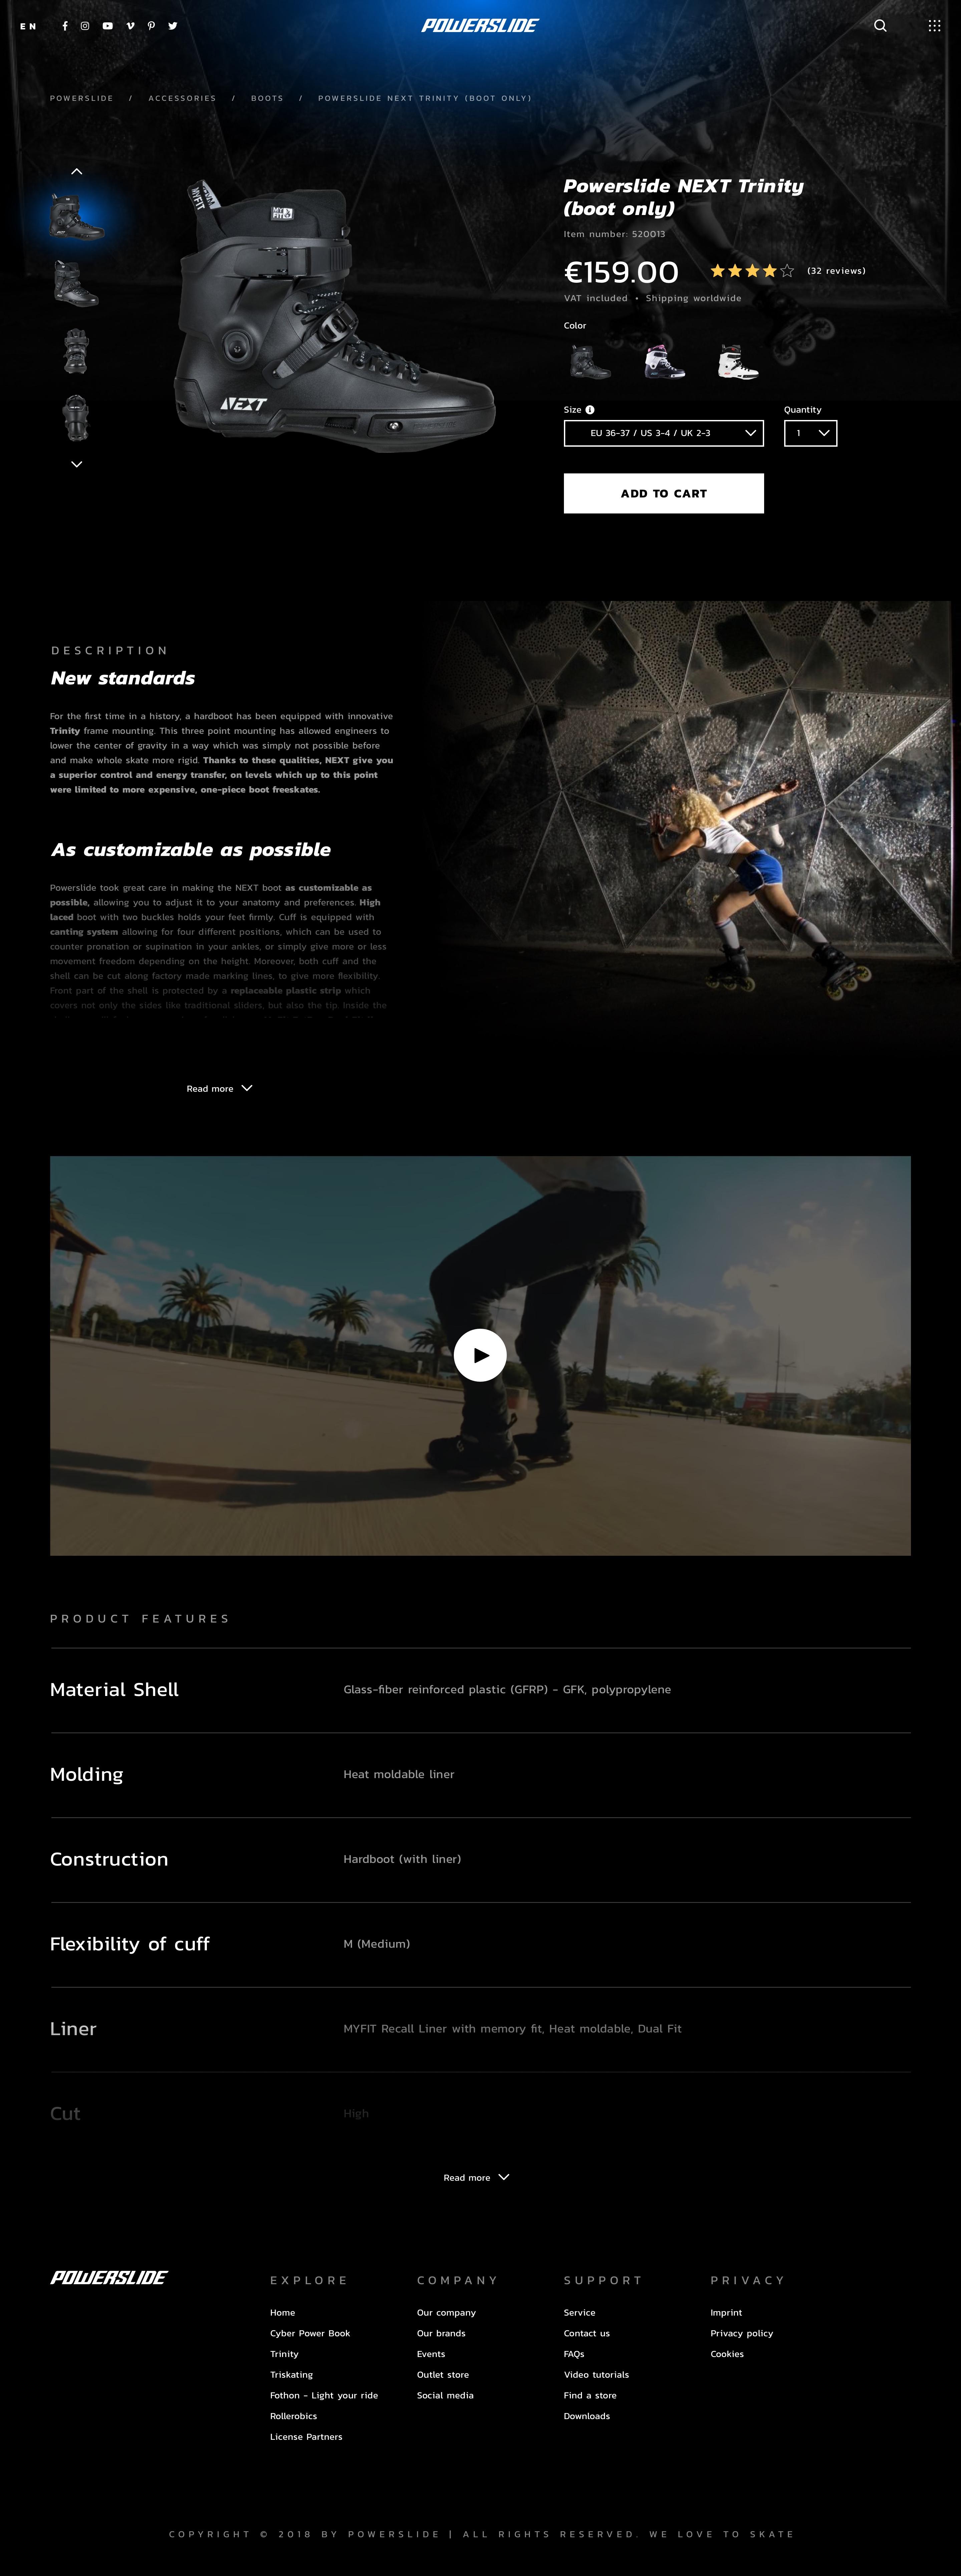 Powerslide concept product details dark